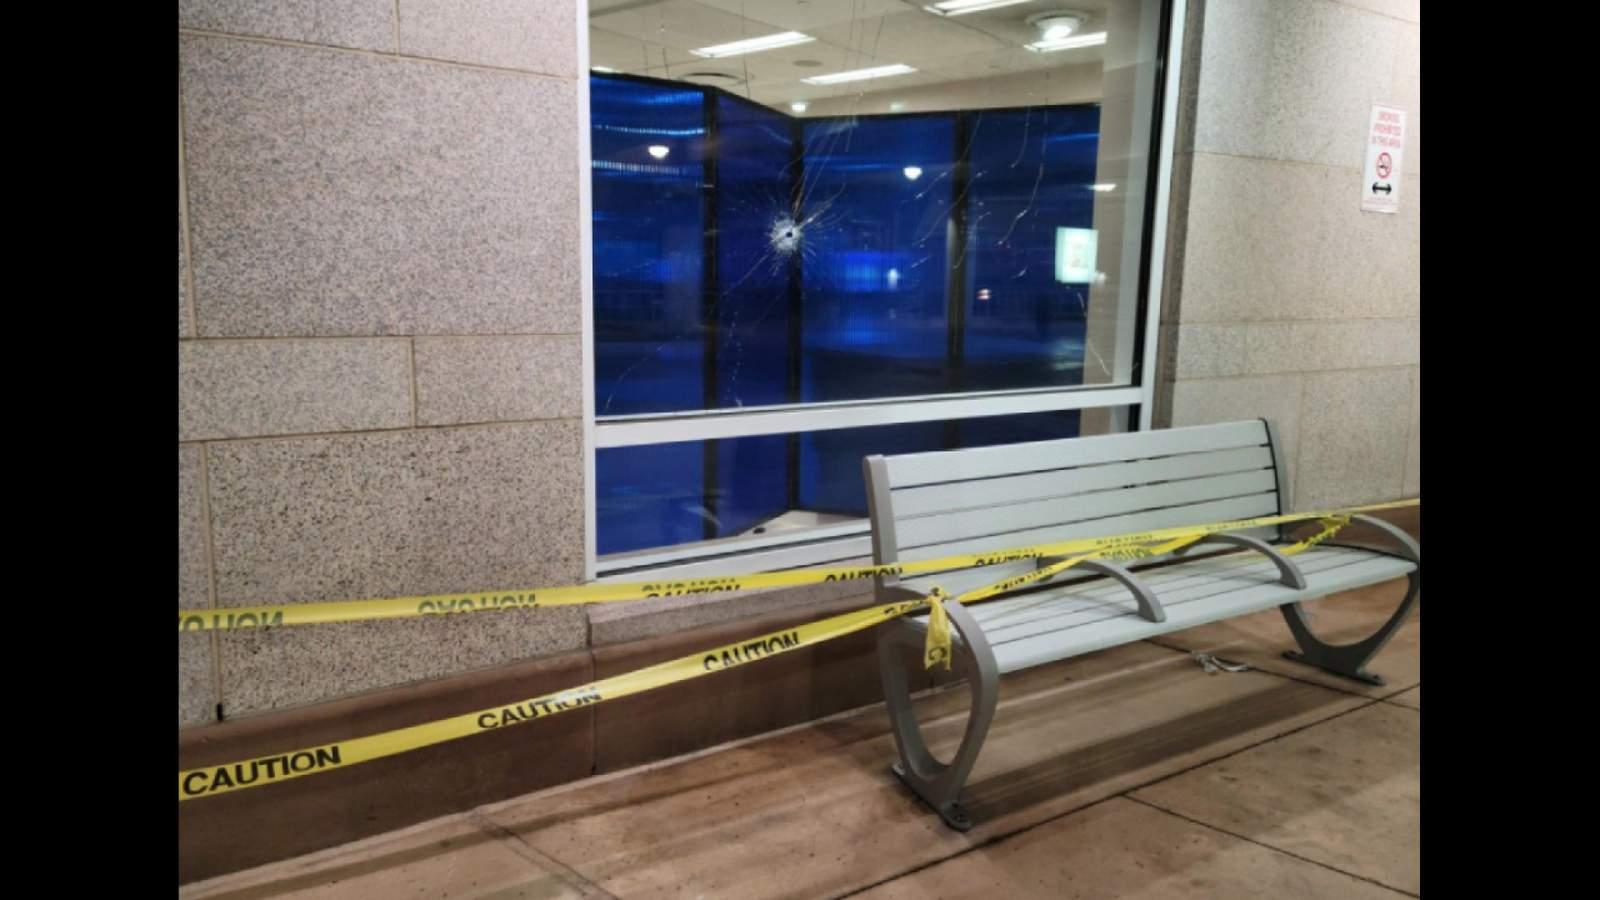 San Antonio airport shooting suspect had lengthy criminal record, no history of violent offenses